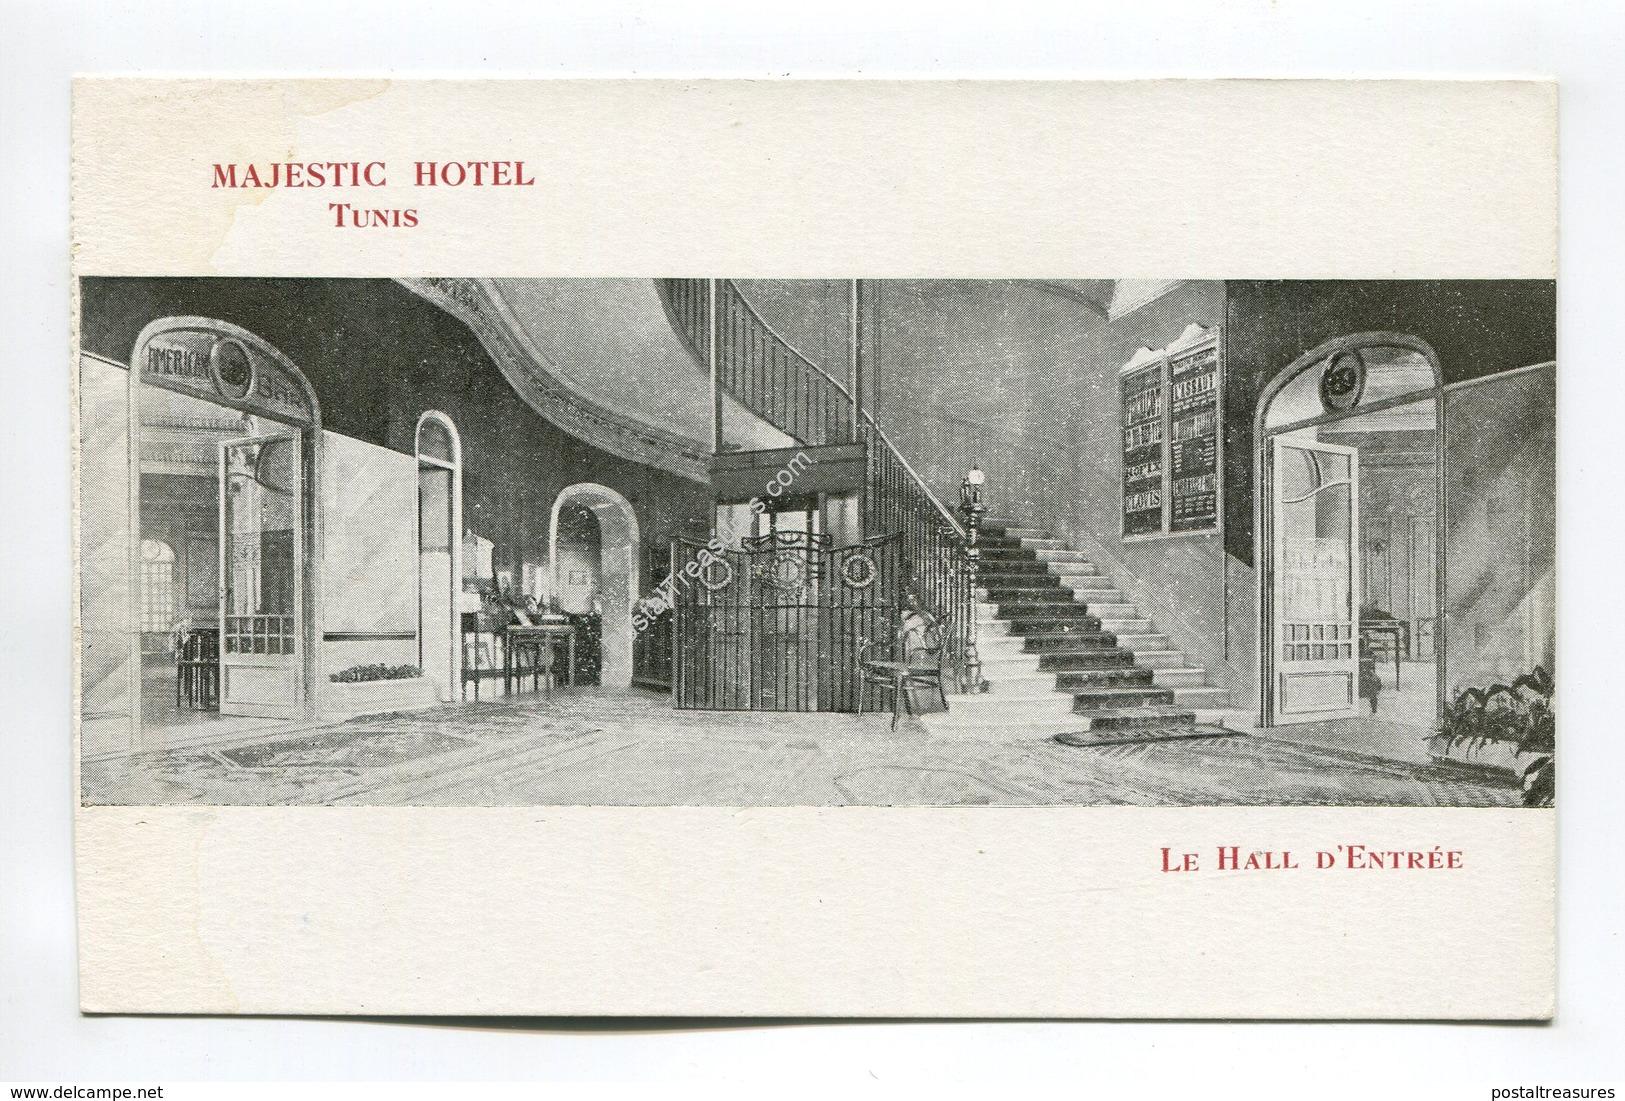 Le Hall D'Entree Majestic Hotel Tunis - Tunisia